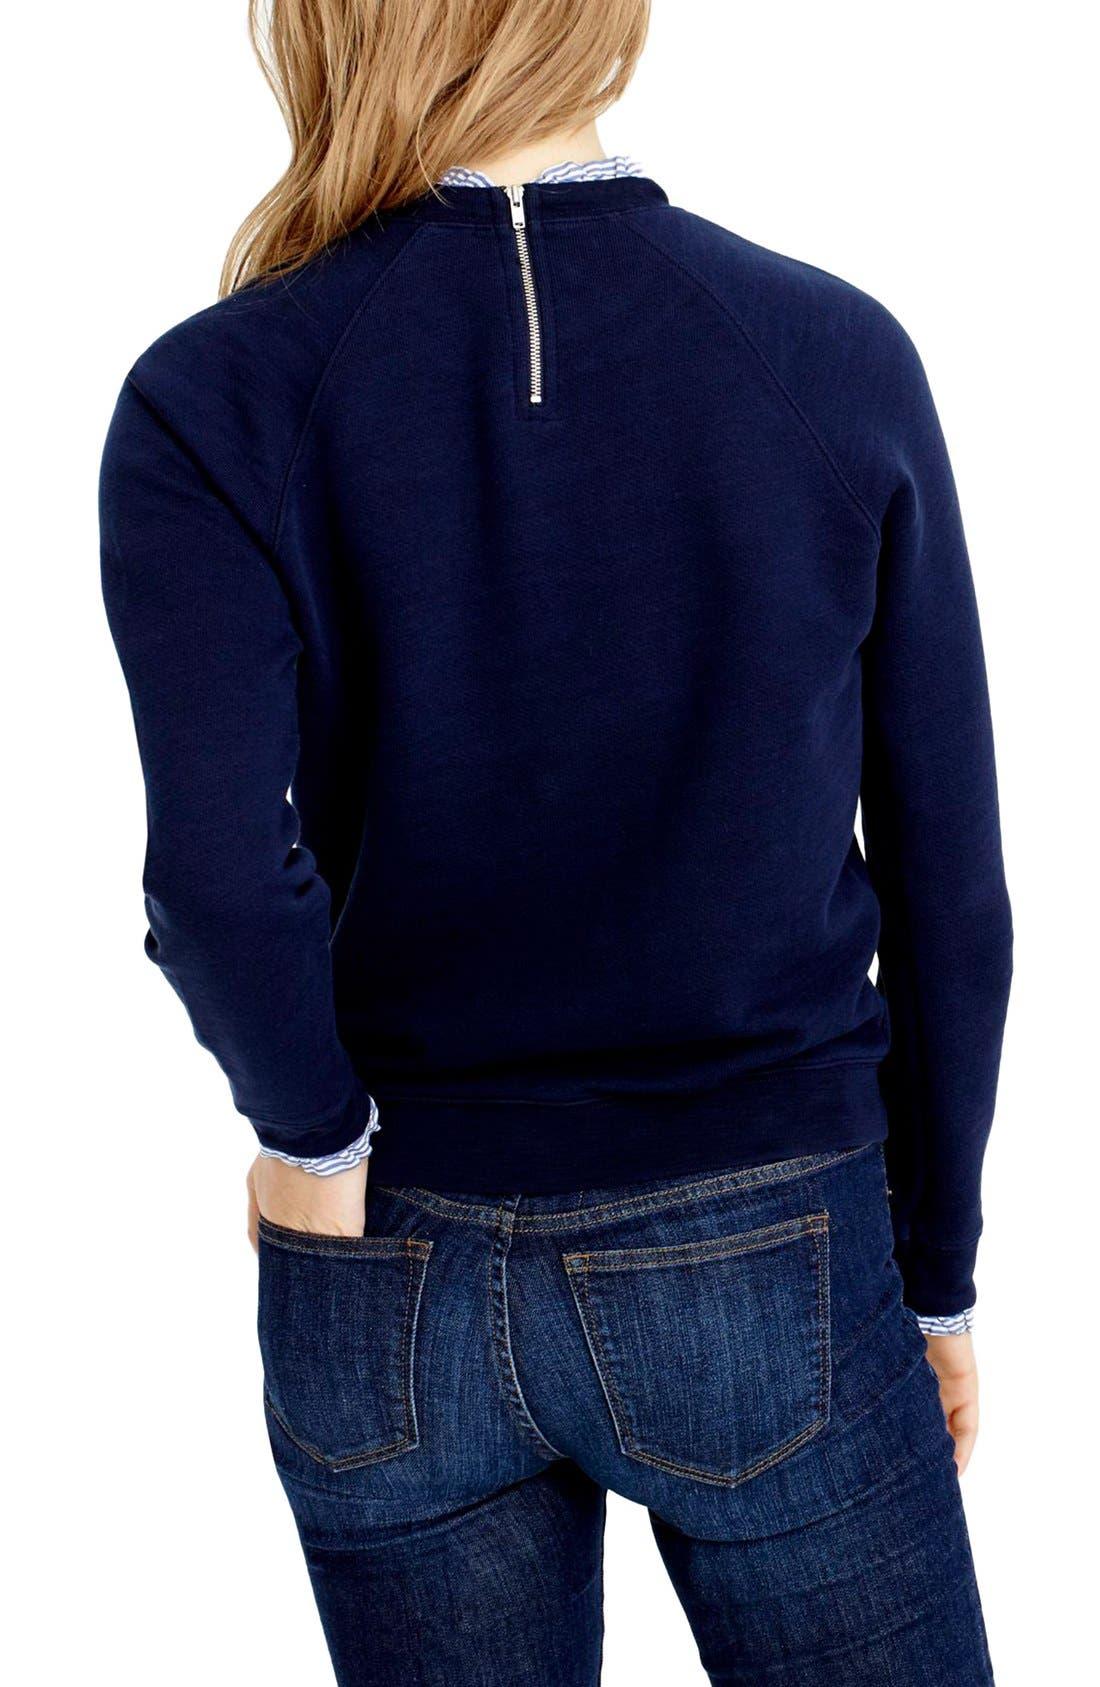 Ruffle Trim Sweatshirt,                             Alternate thumbnail 2, color,                             400